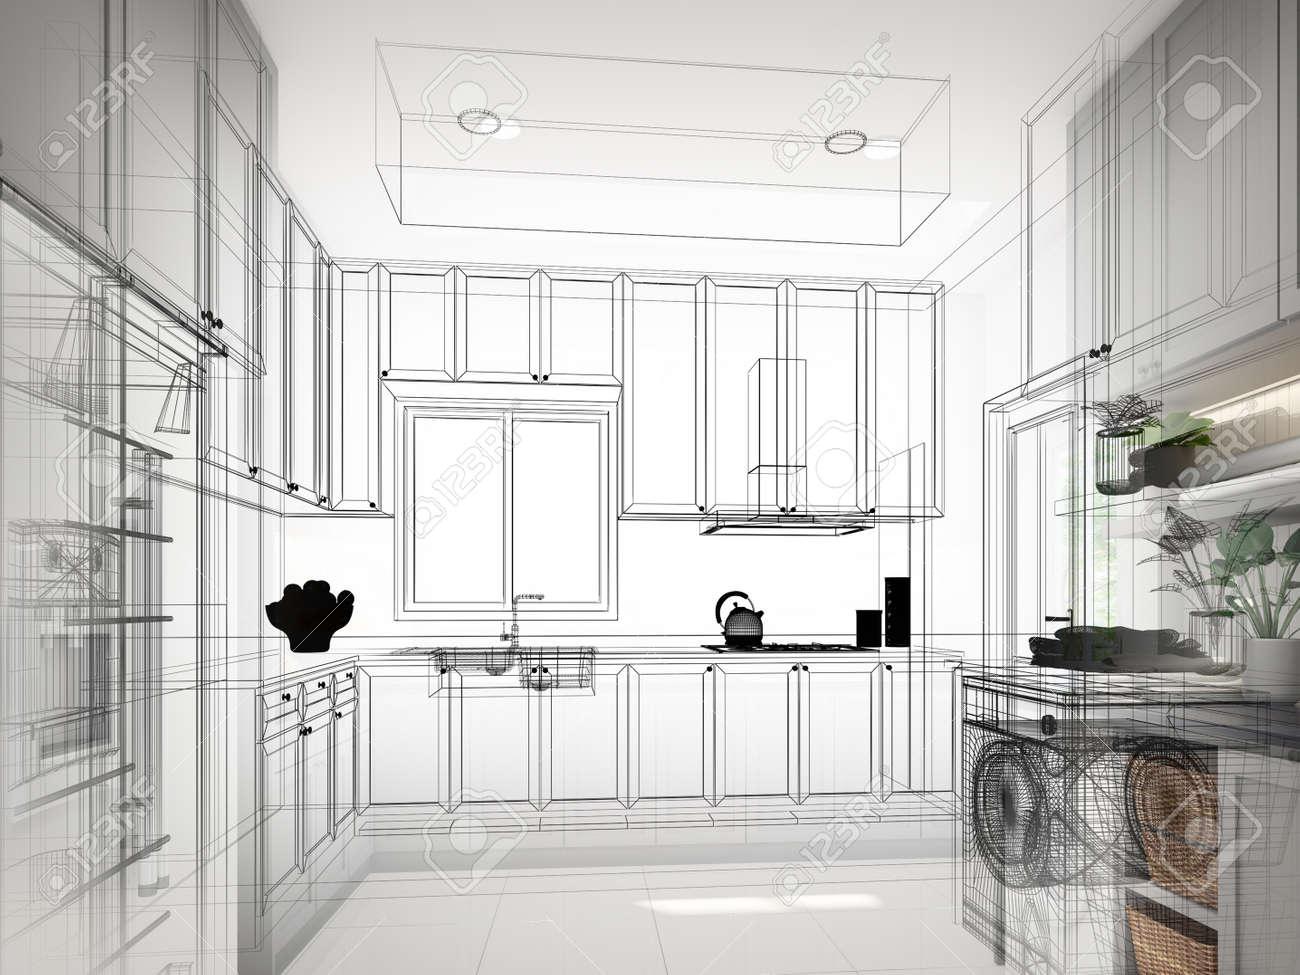 abstract sketch design of kitchen room ,3d rendering - 159218572